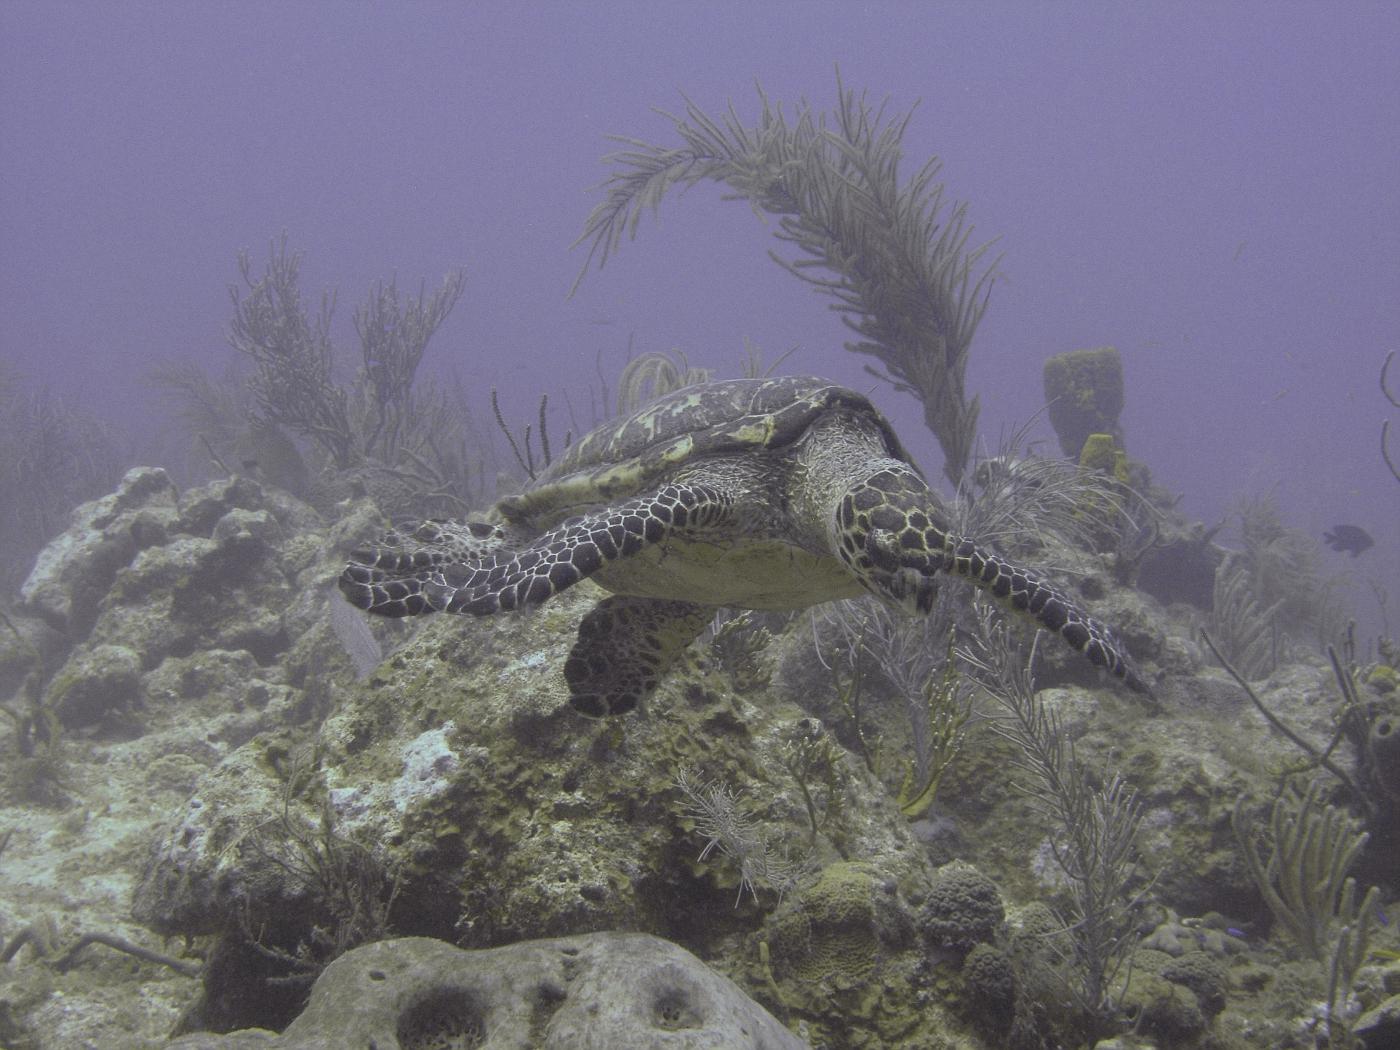 Grand_Cayman-38.jpg